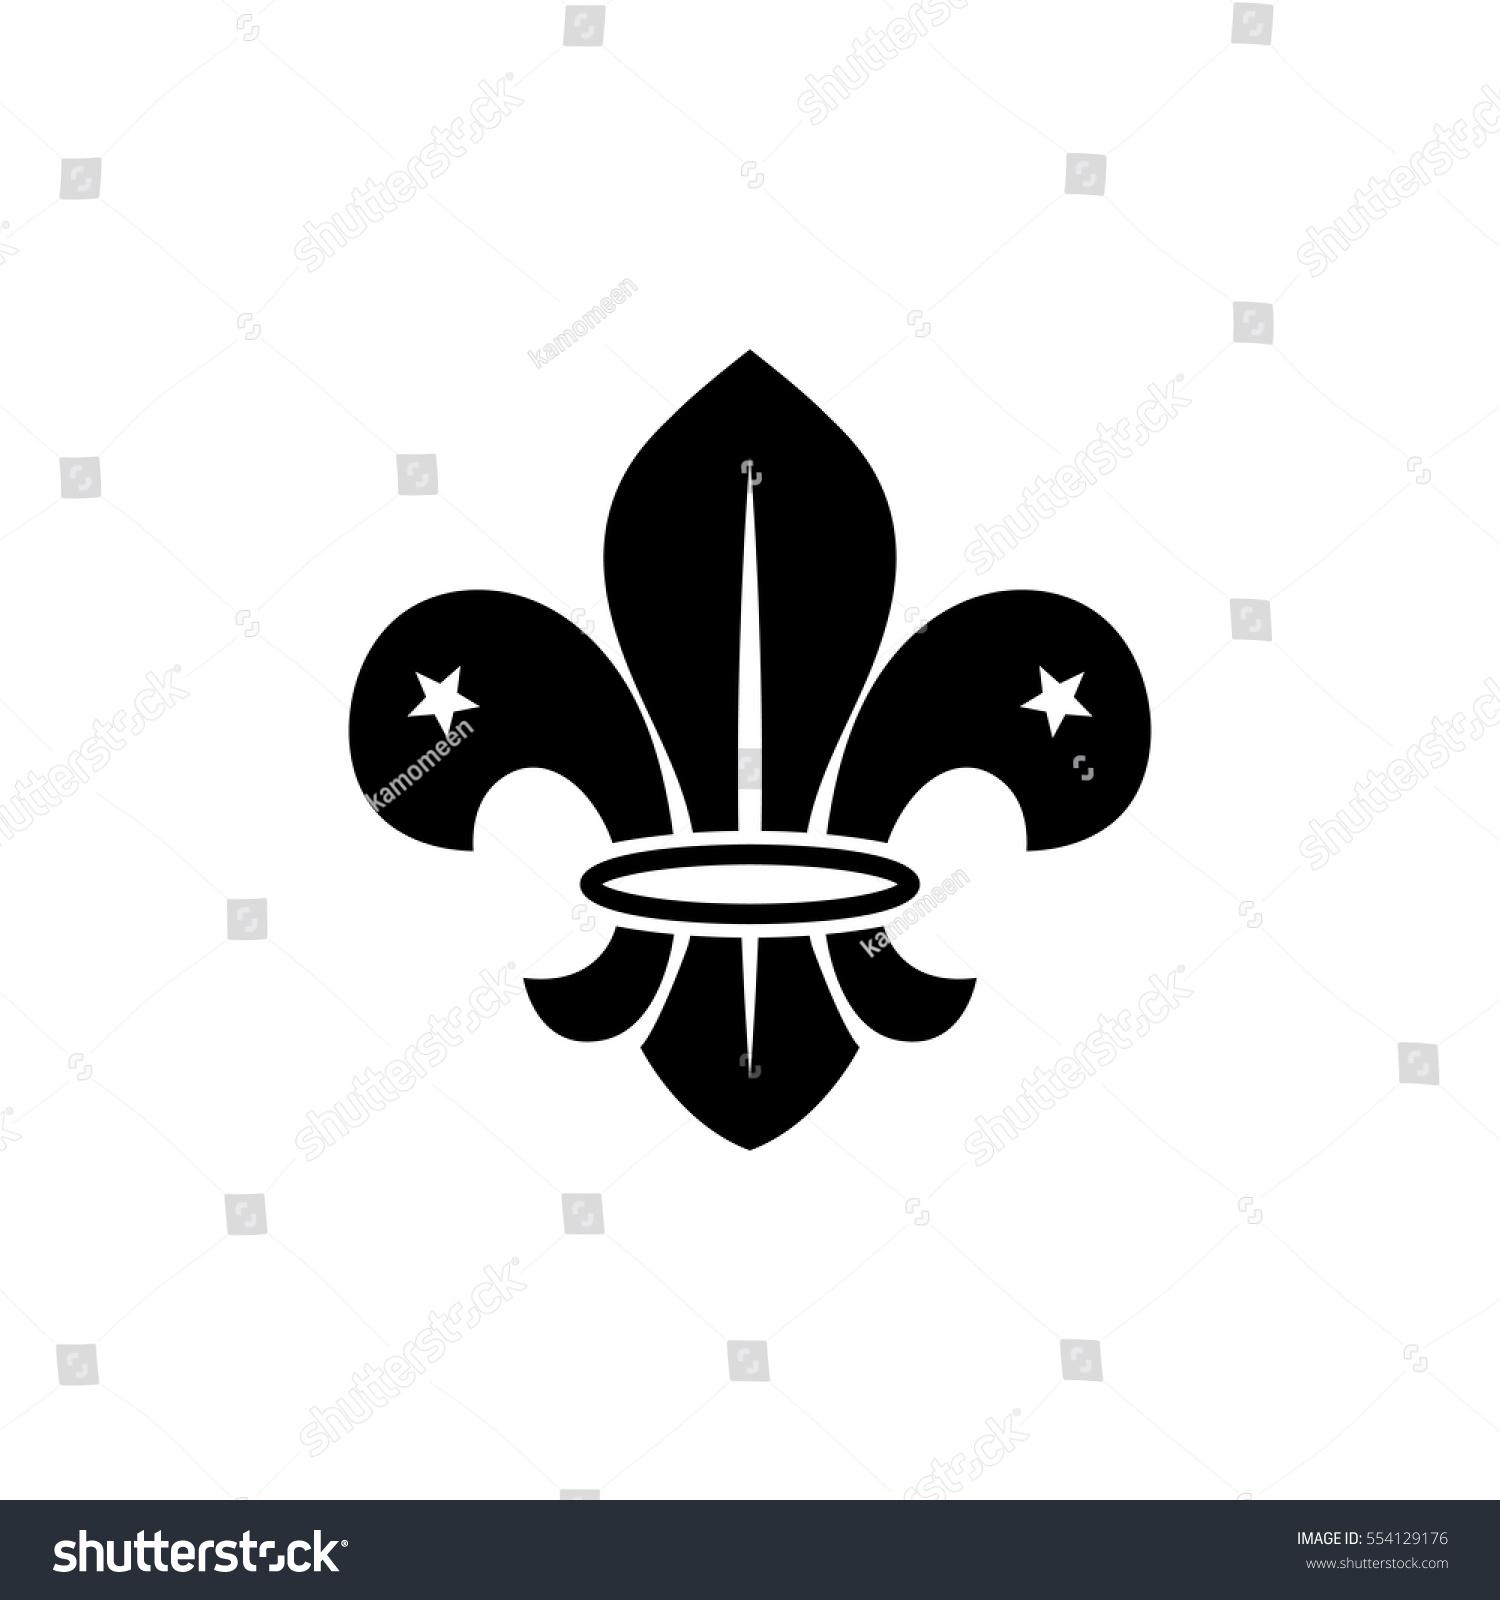 Fleur De Lis French Symbol Design Stock Vector Royalty Free